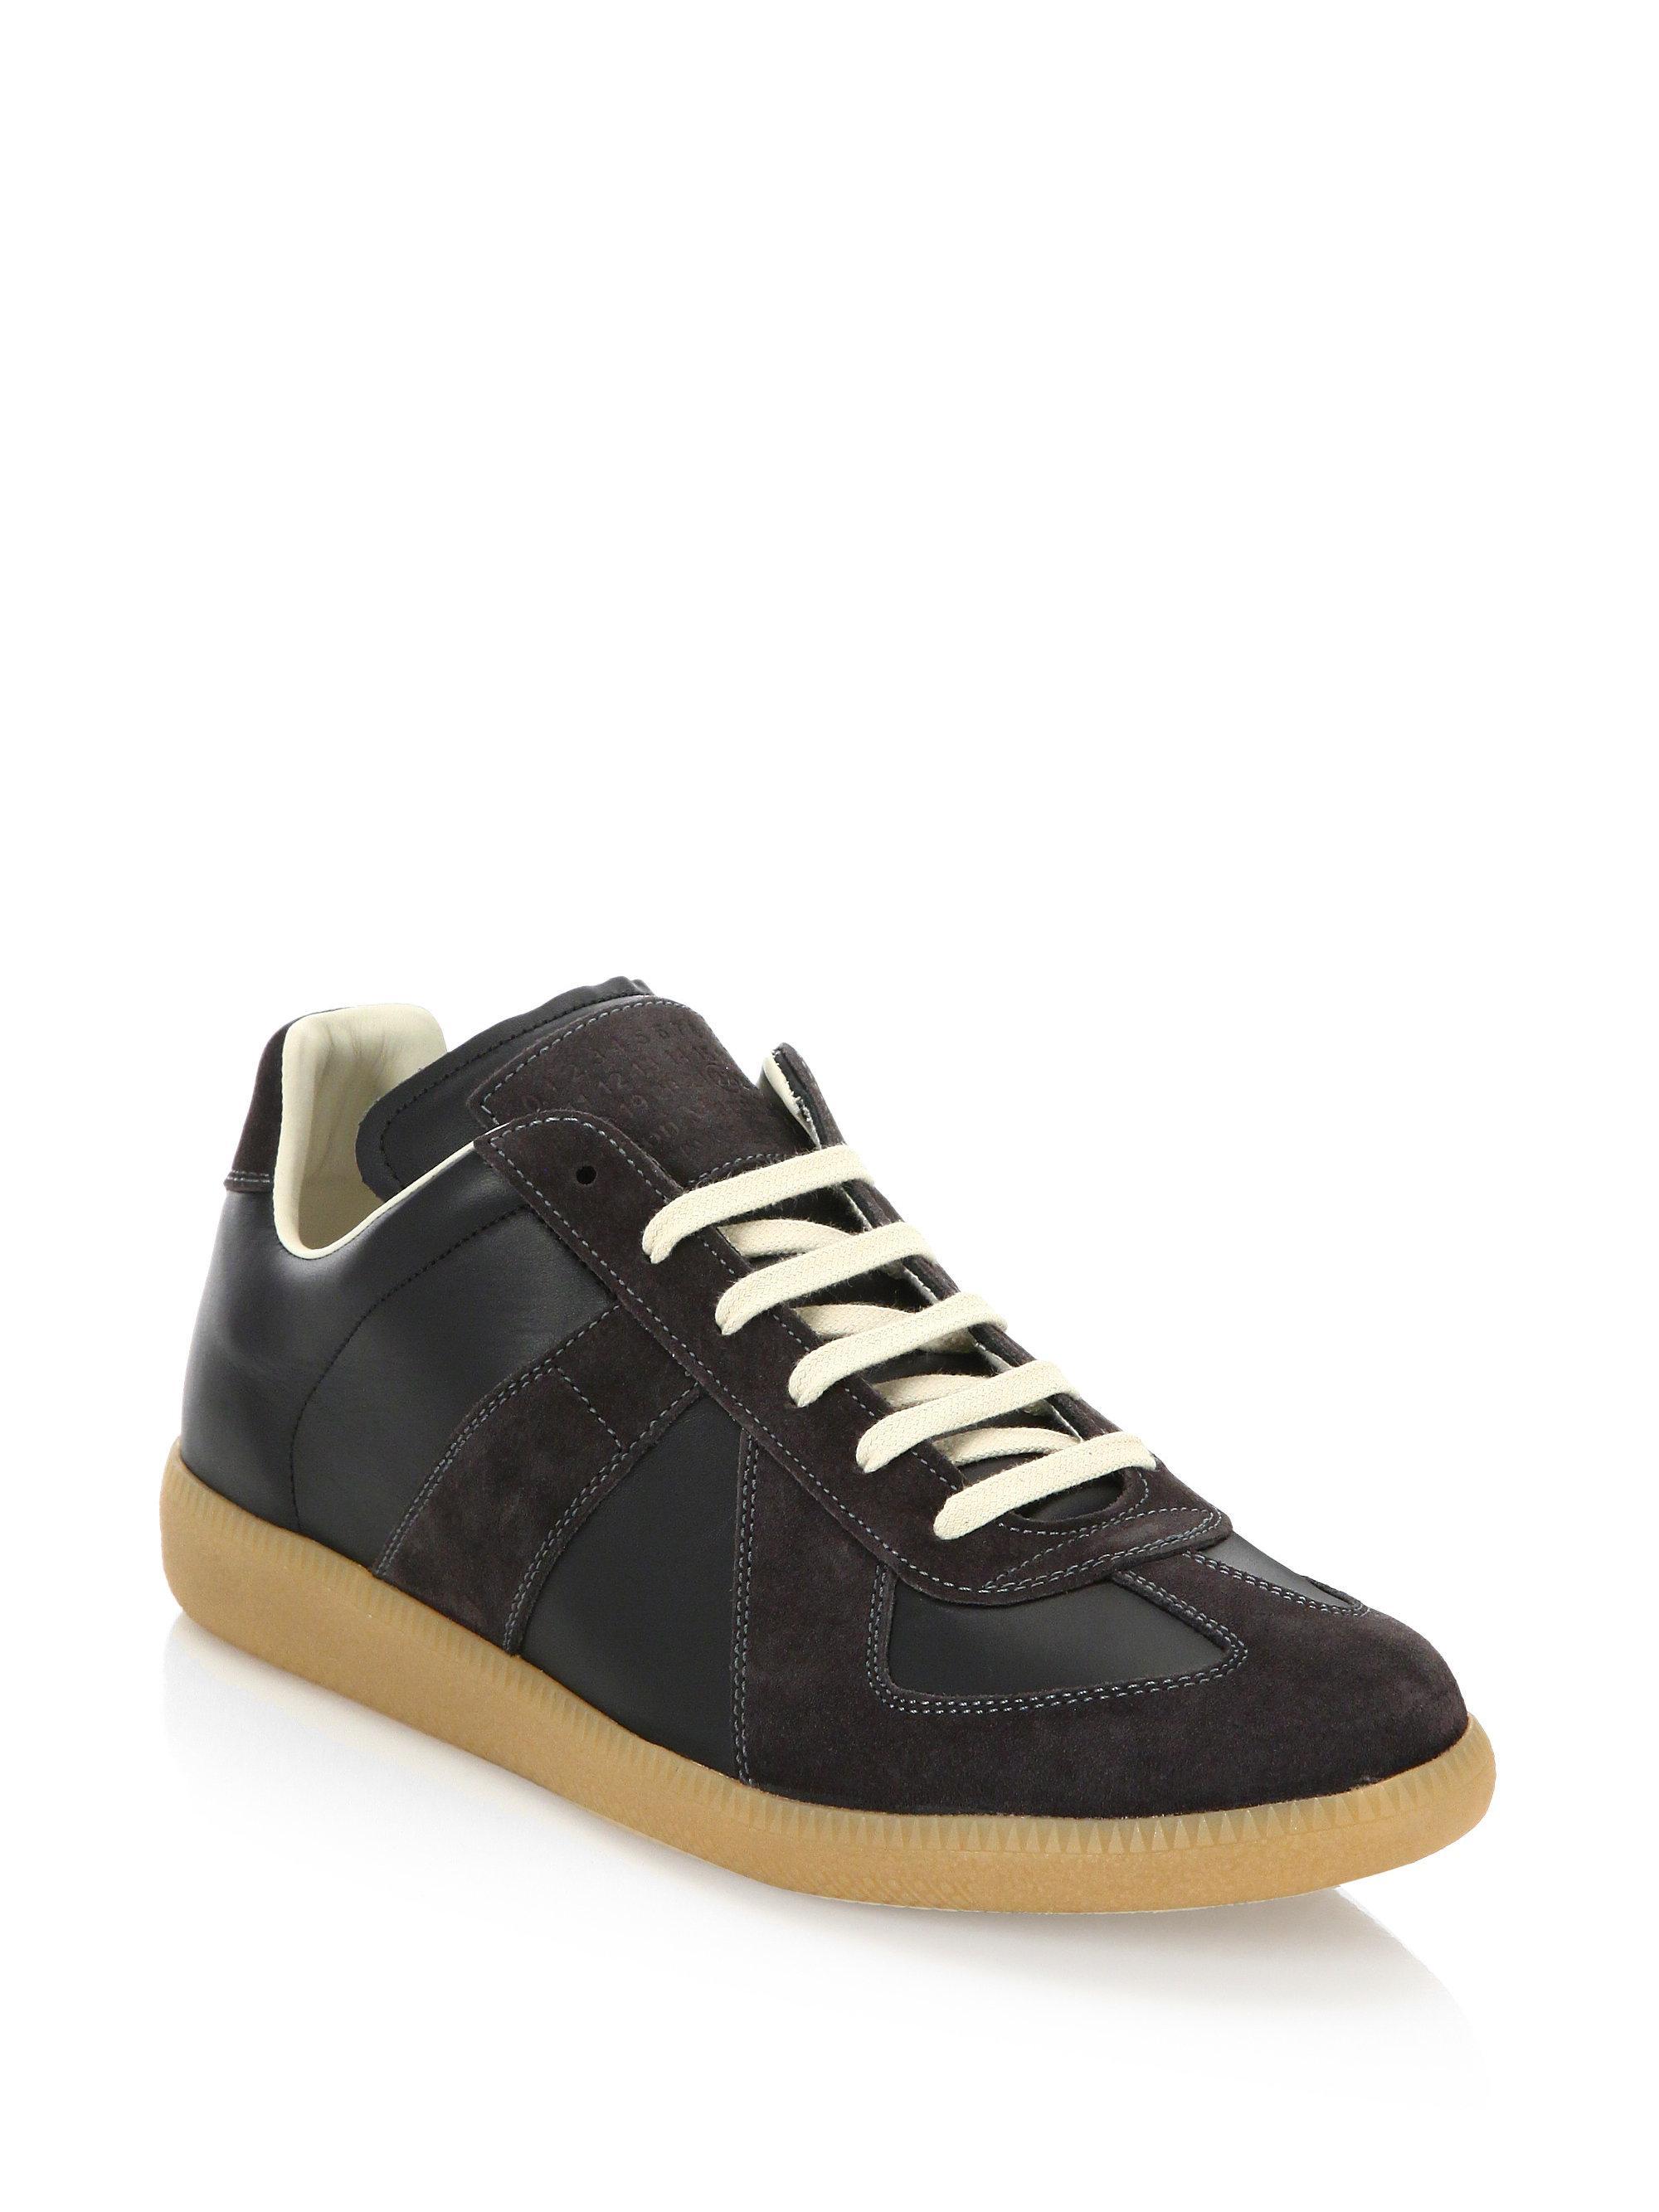 Maison Margiela Black & Brown Classic Mid Sneakers uzWCp8nu